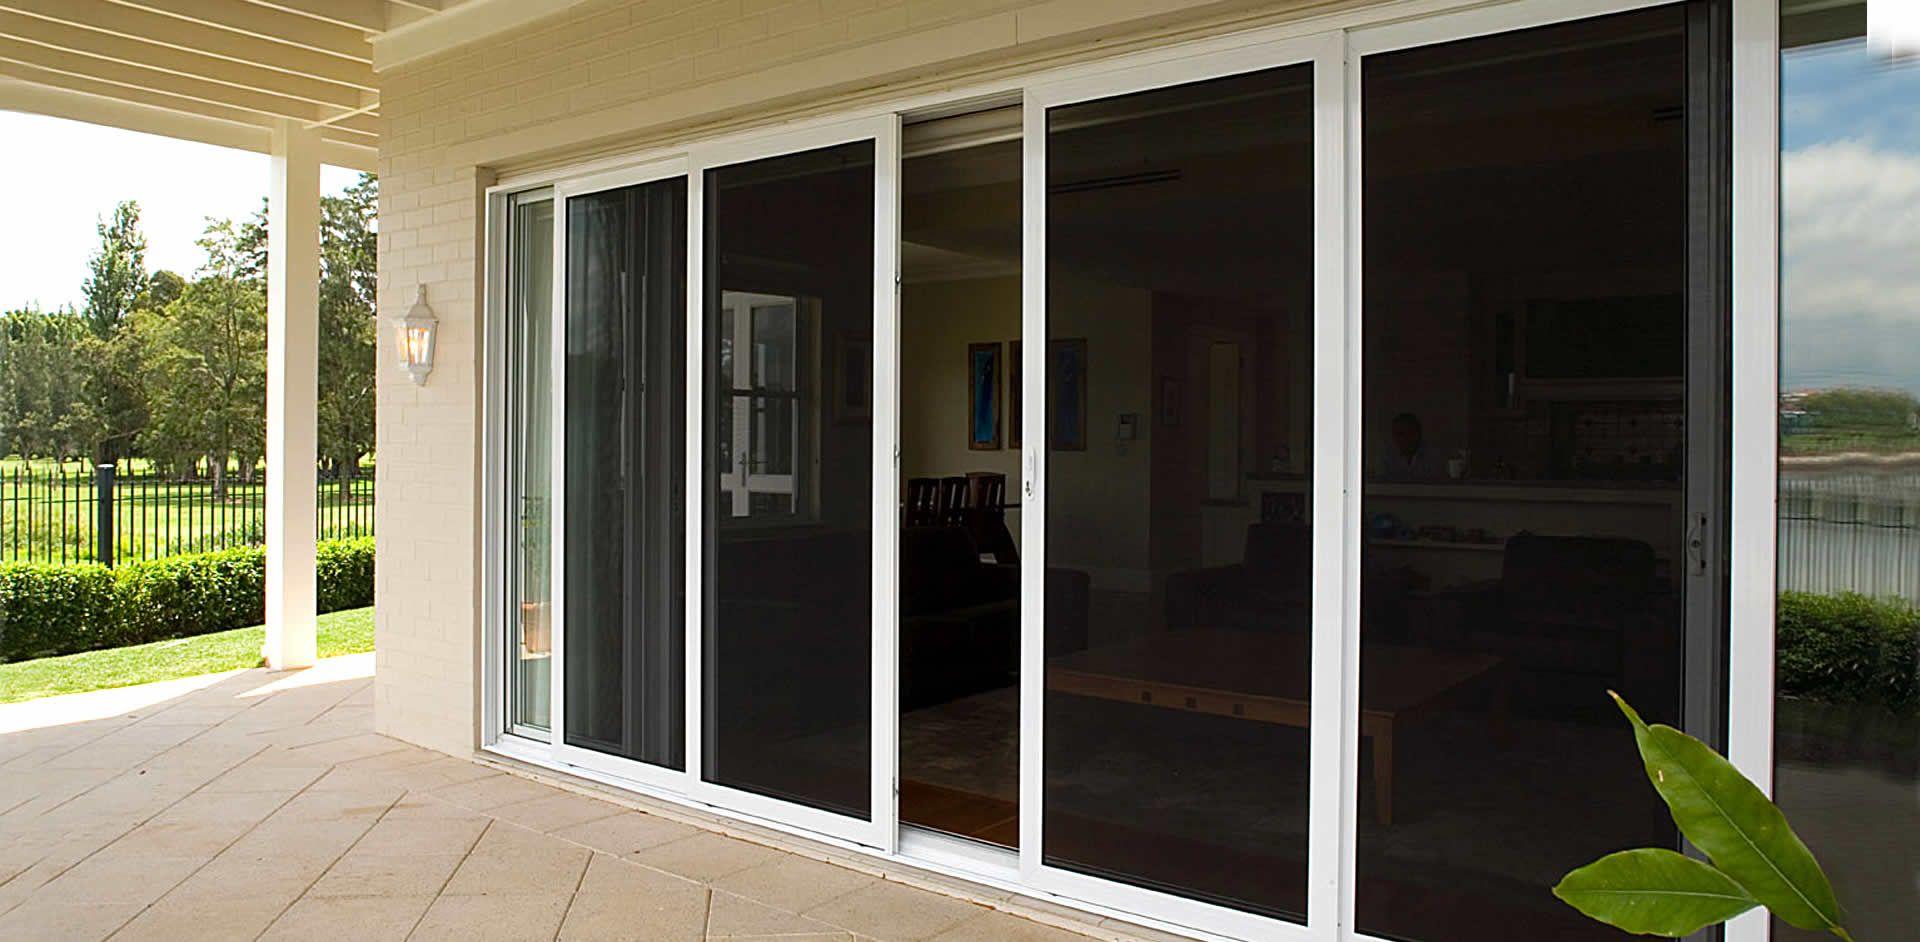 Security Screens For Doors And Windows Sliding Screen Doors